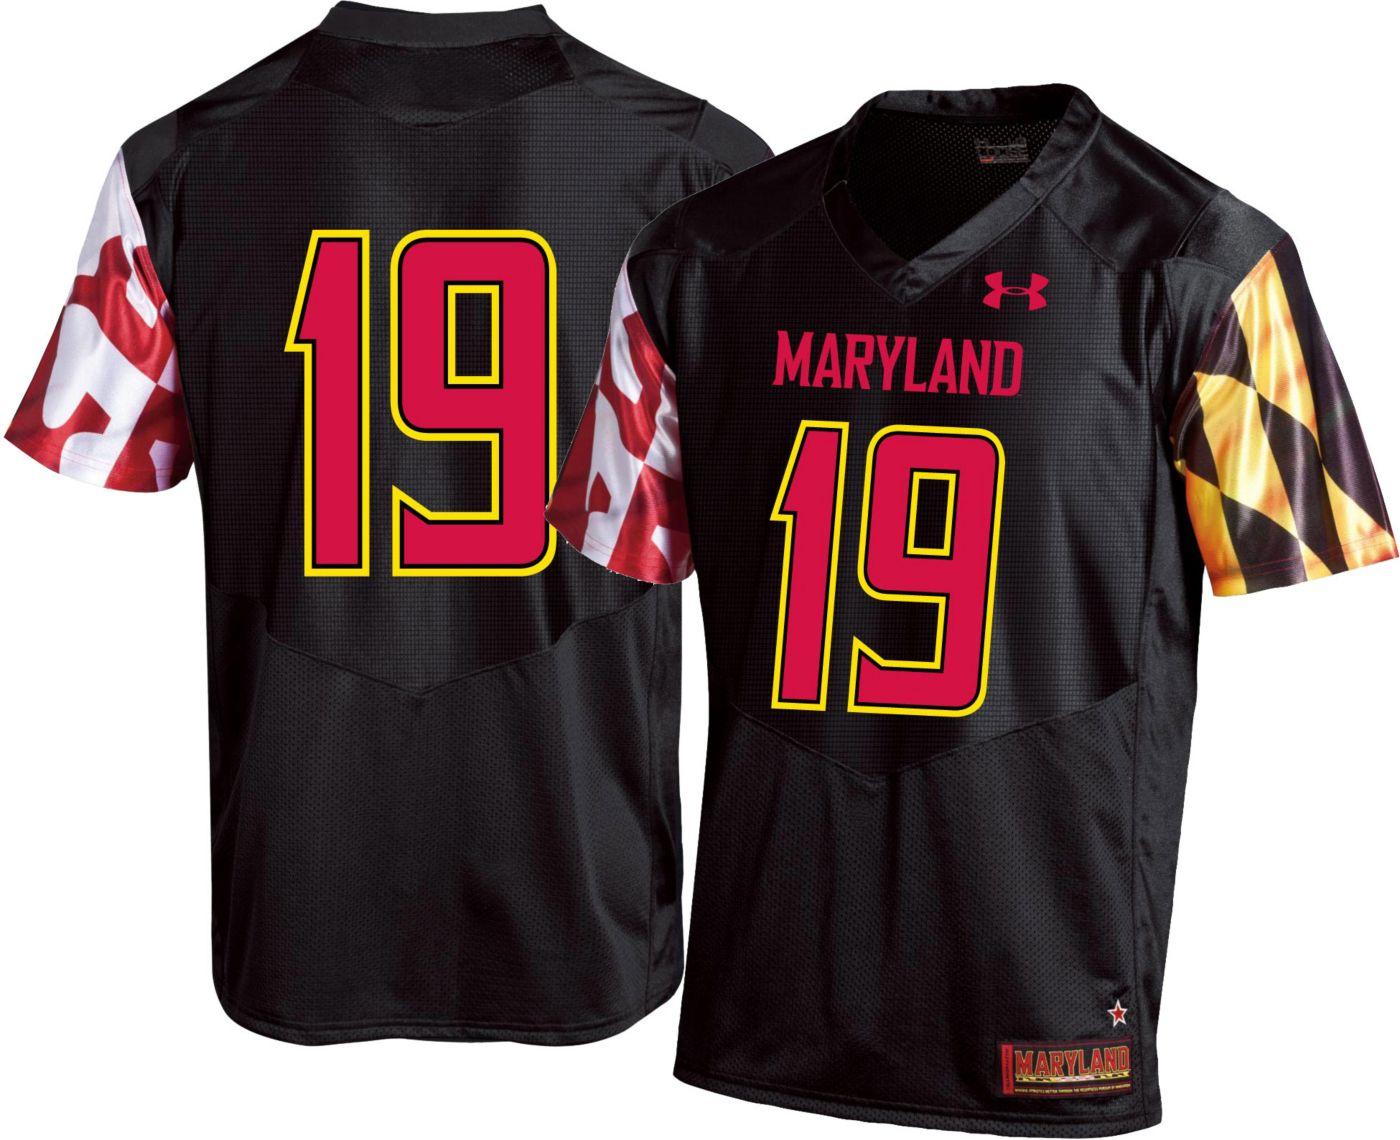 Under Armour Men's Maryland Terrapins #19 Replica Football Black Jersey